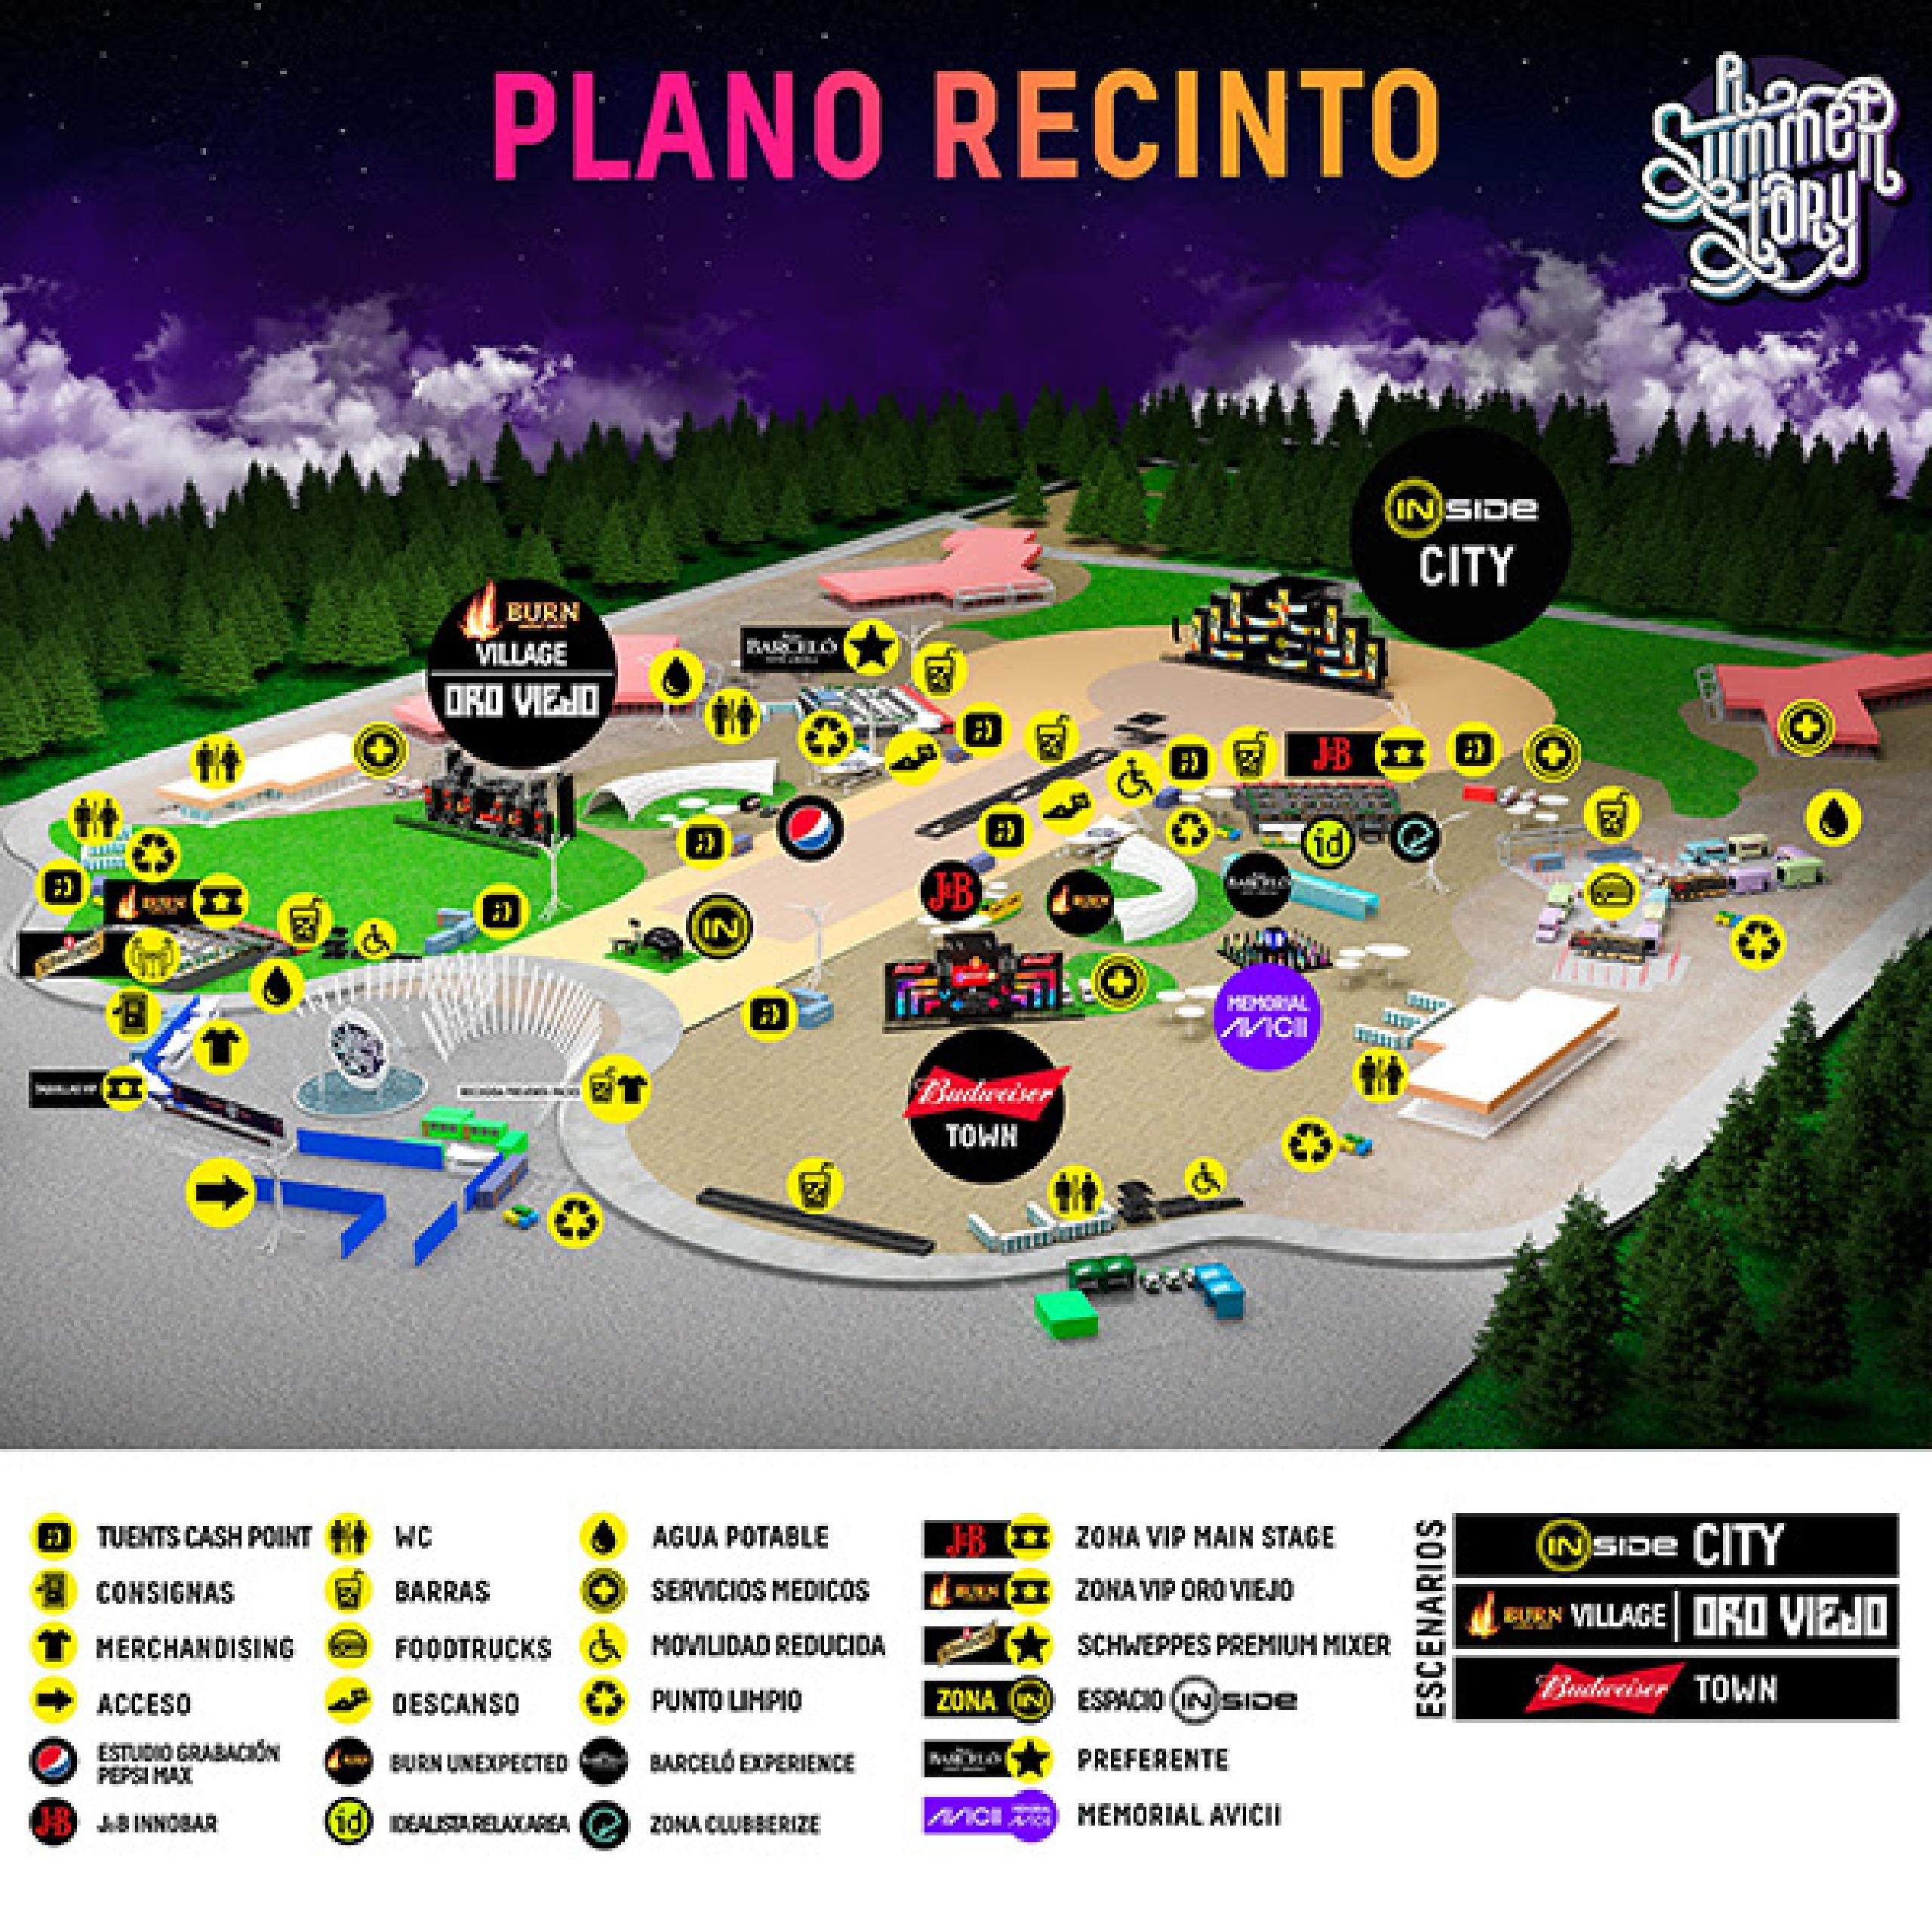 Plano del recinto A Summer Story 2018